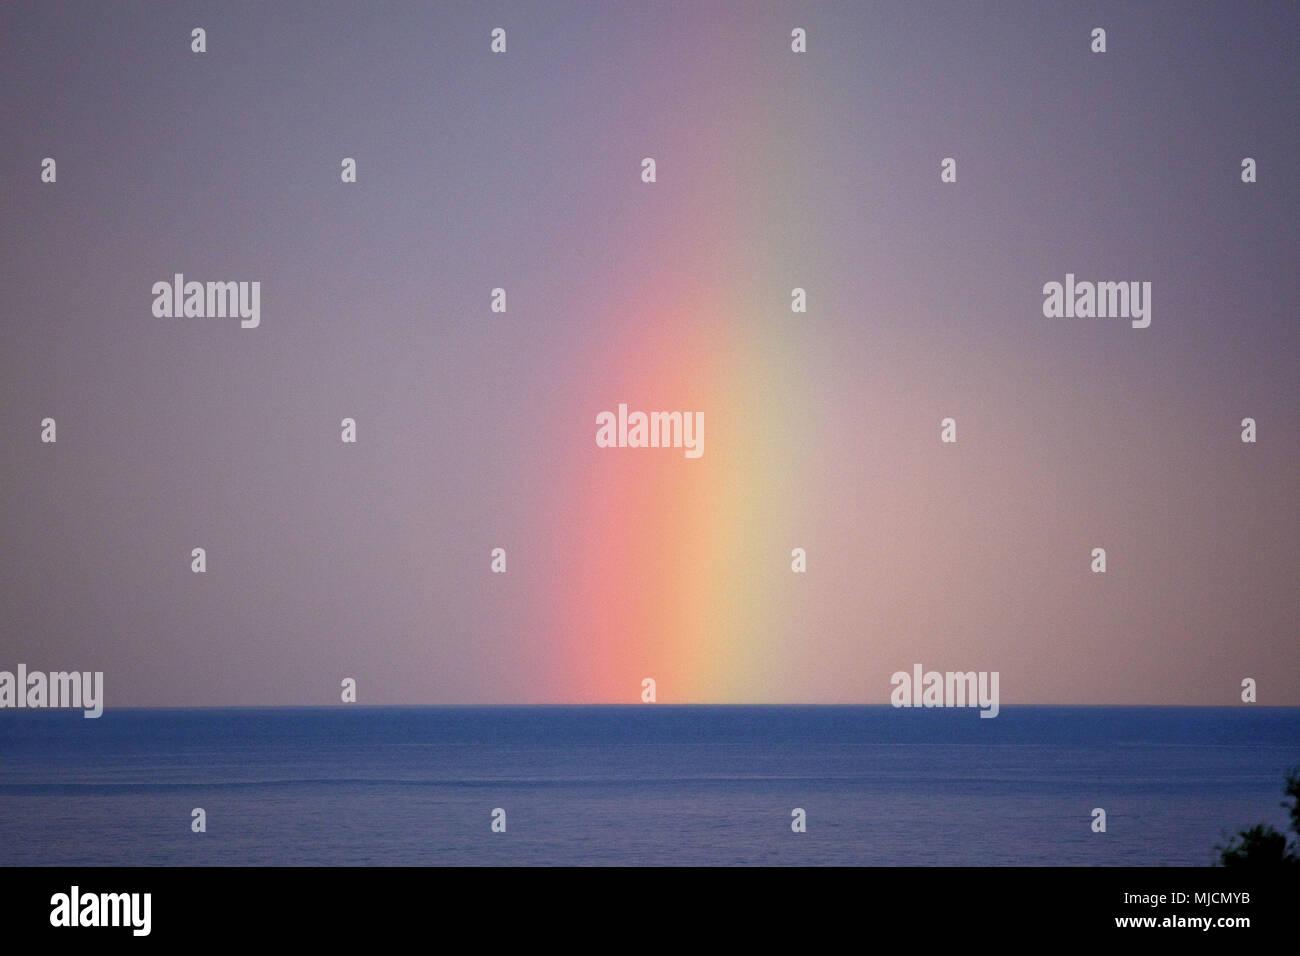 Italien, Sardinien, Ostküste, Castiadas, Sant'Elmo, Costa Rei, Meer, Horizont, Himmel, Regenbogen, Stockbild